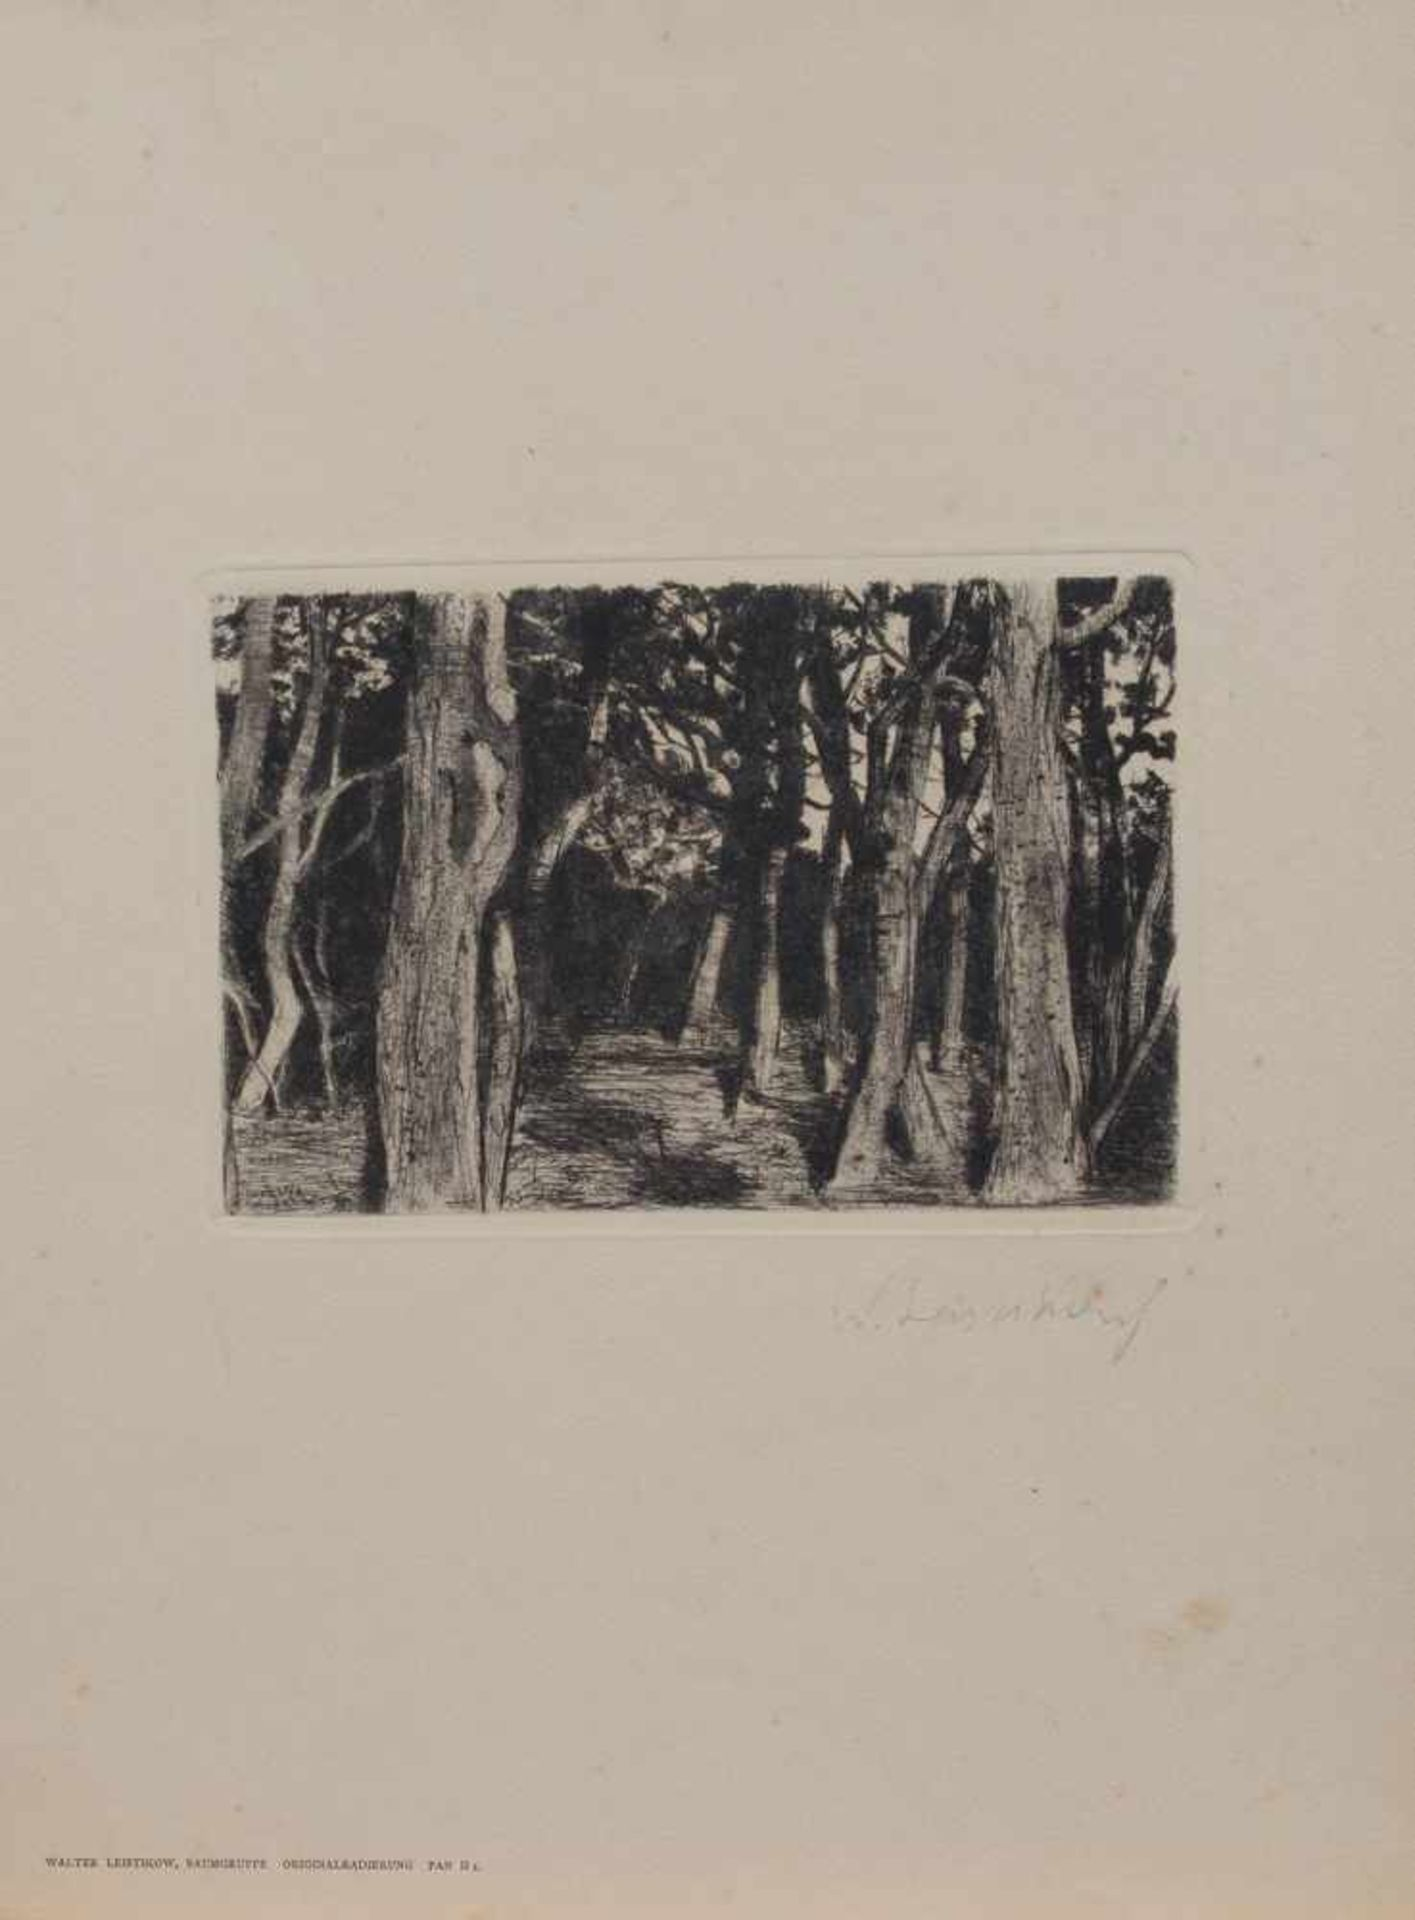 Los 22 - Walter Leistikow (Bromberg 1865 - 1908 Berlin, deutscher Maler u. Graphiker, Std. bei Hermann Eschke